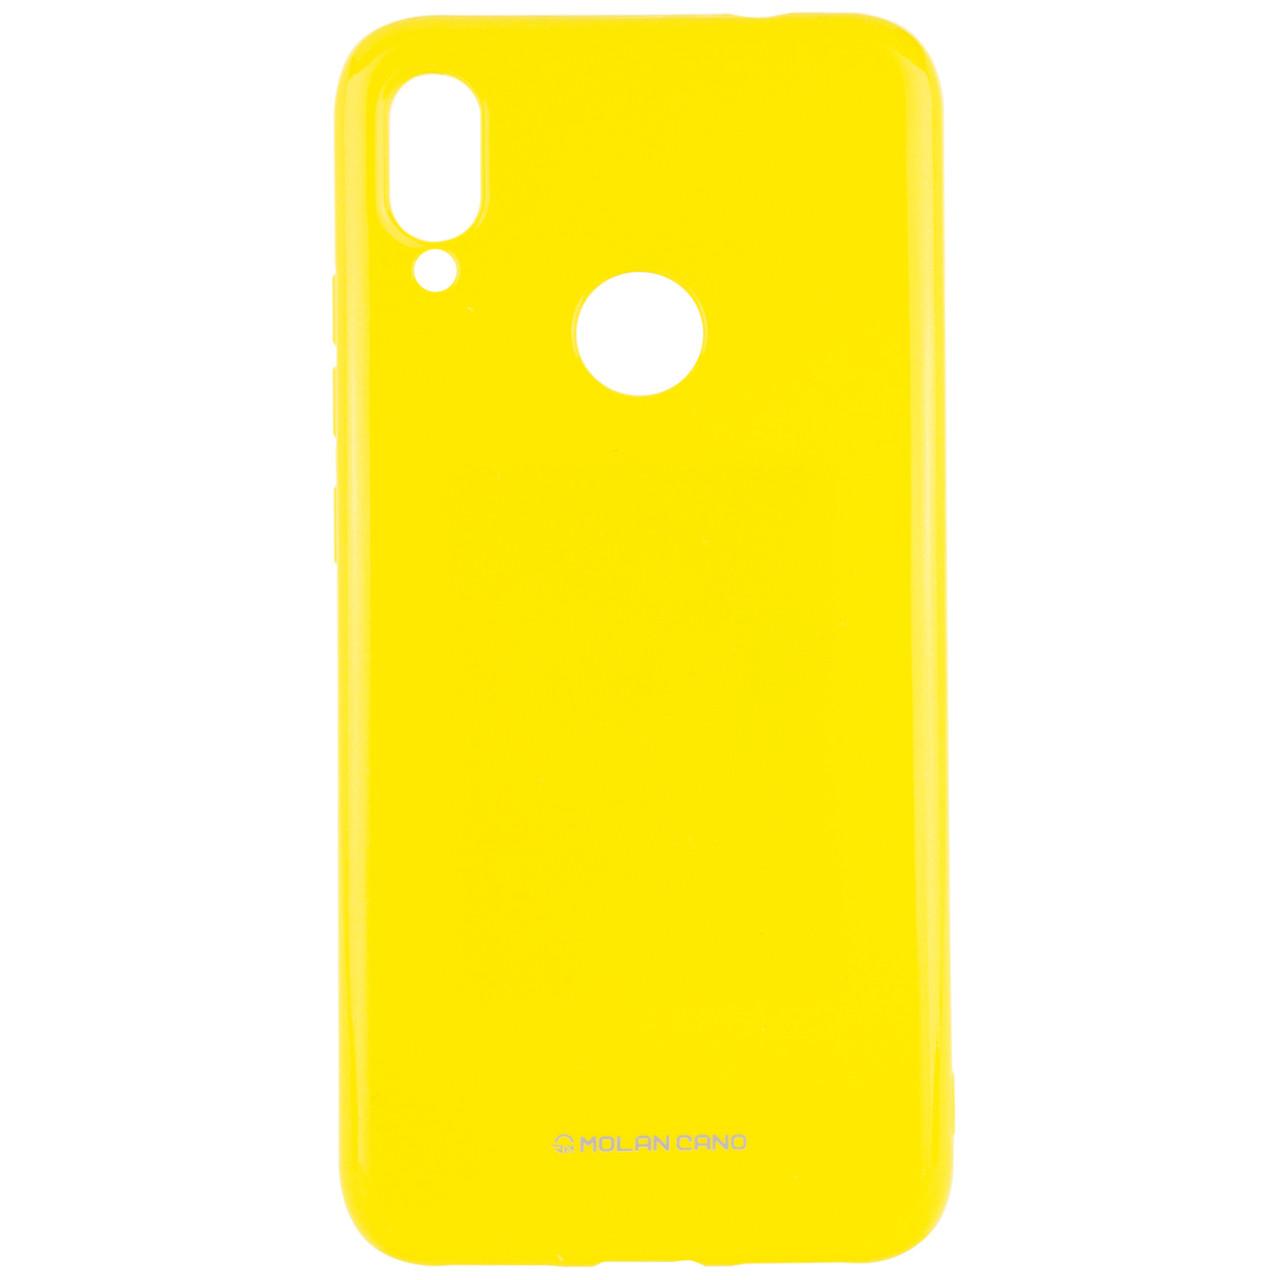 TPU чехол Molan Cano Glossy для Xiaomi Redmi 7